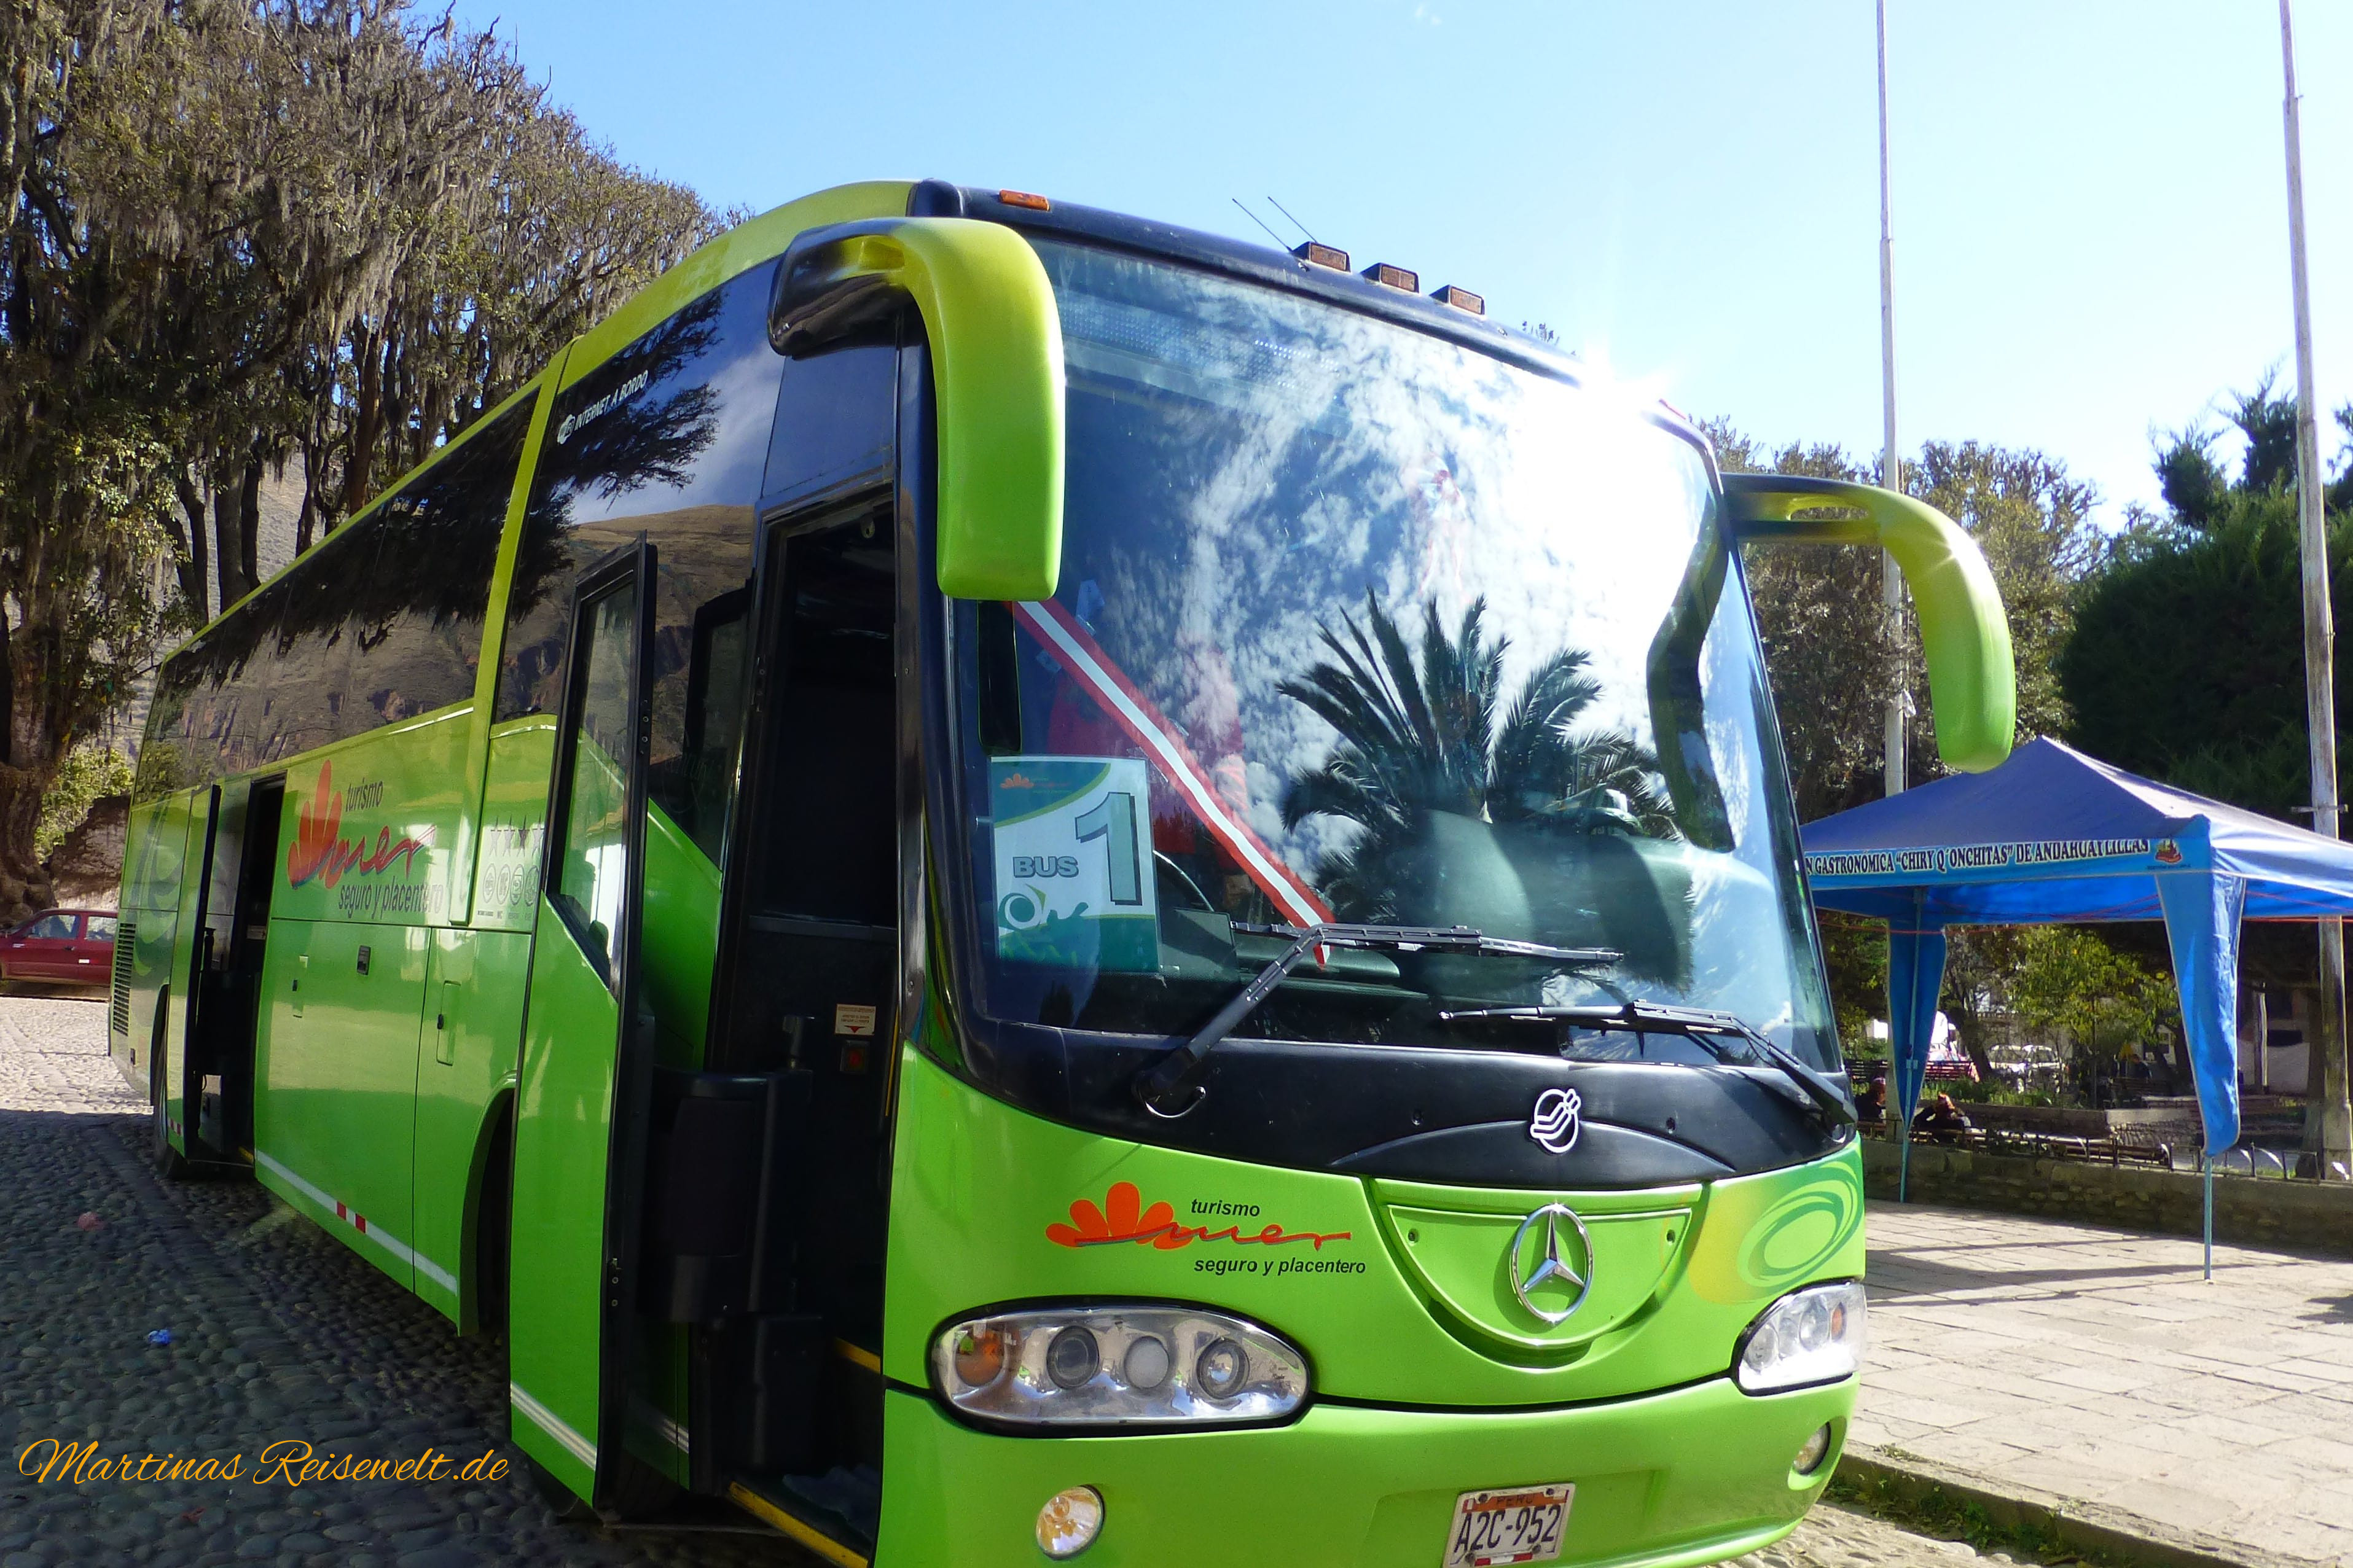 unser grüner Bus